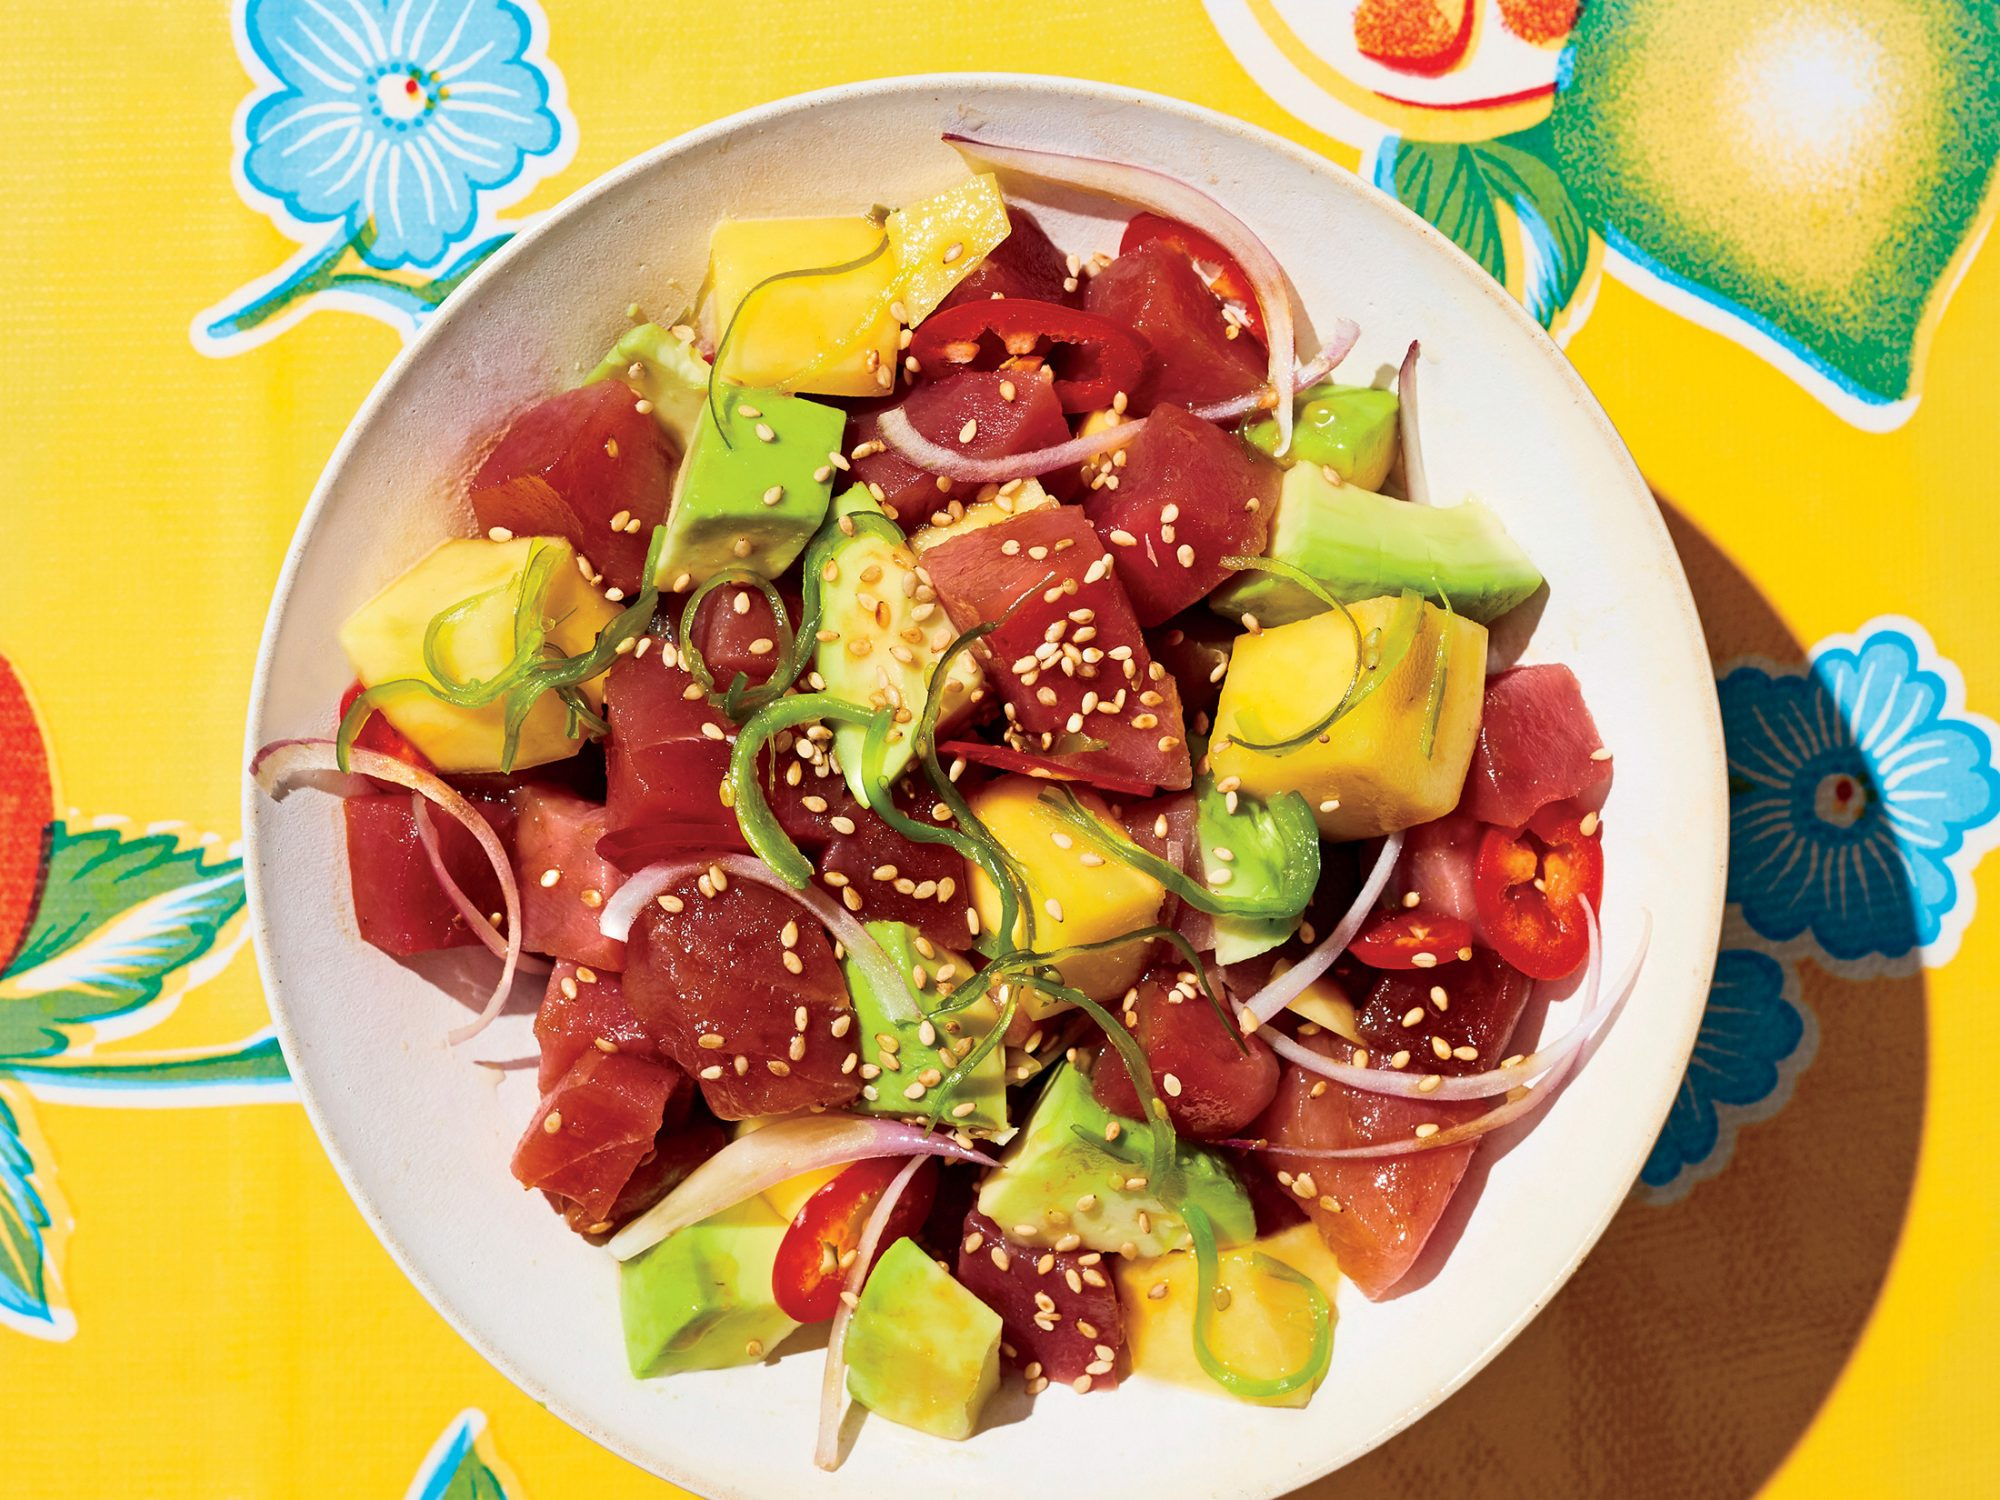 Tuna Poke with Mango and Avocado